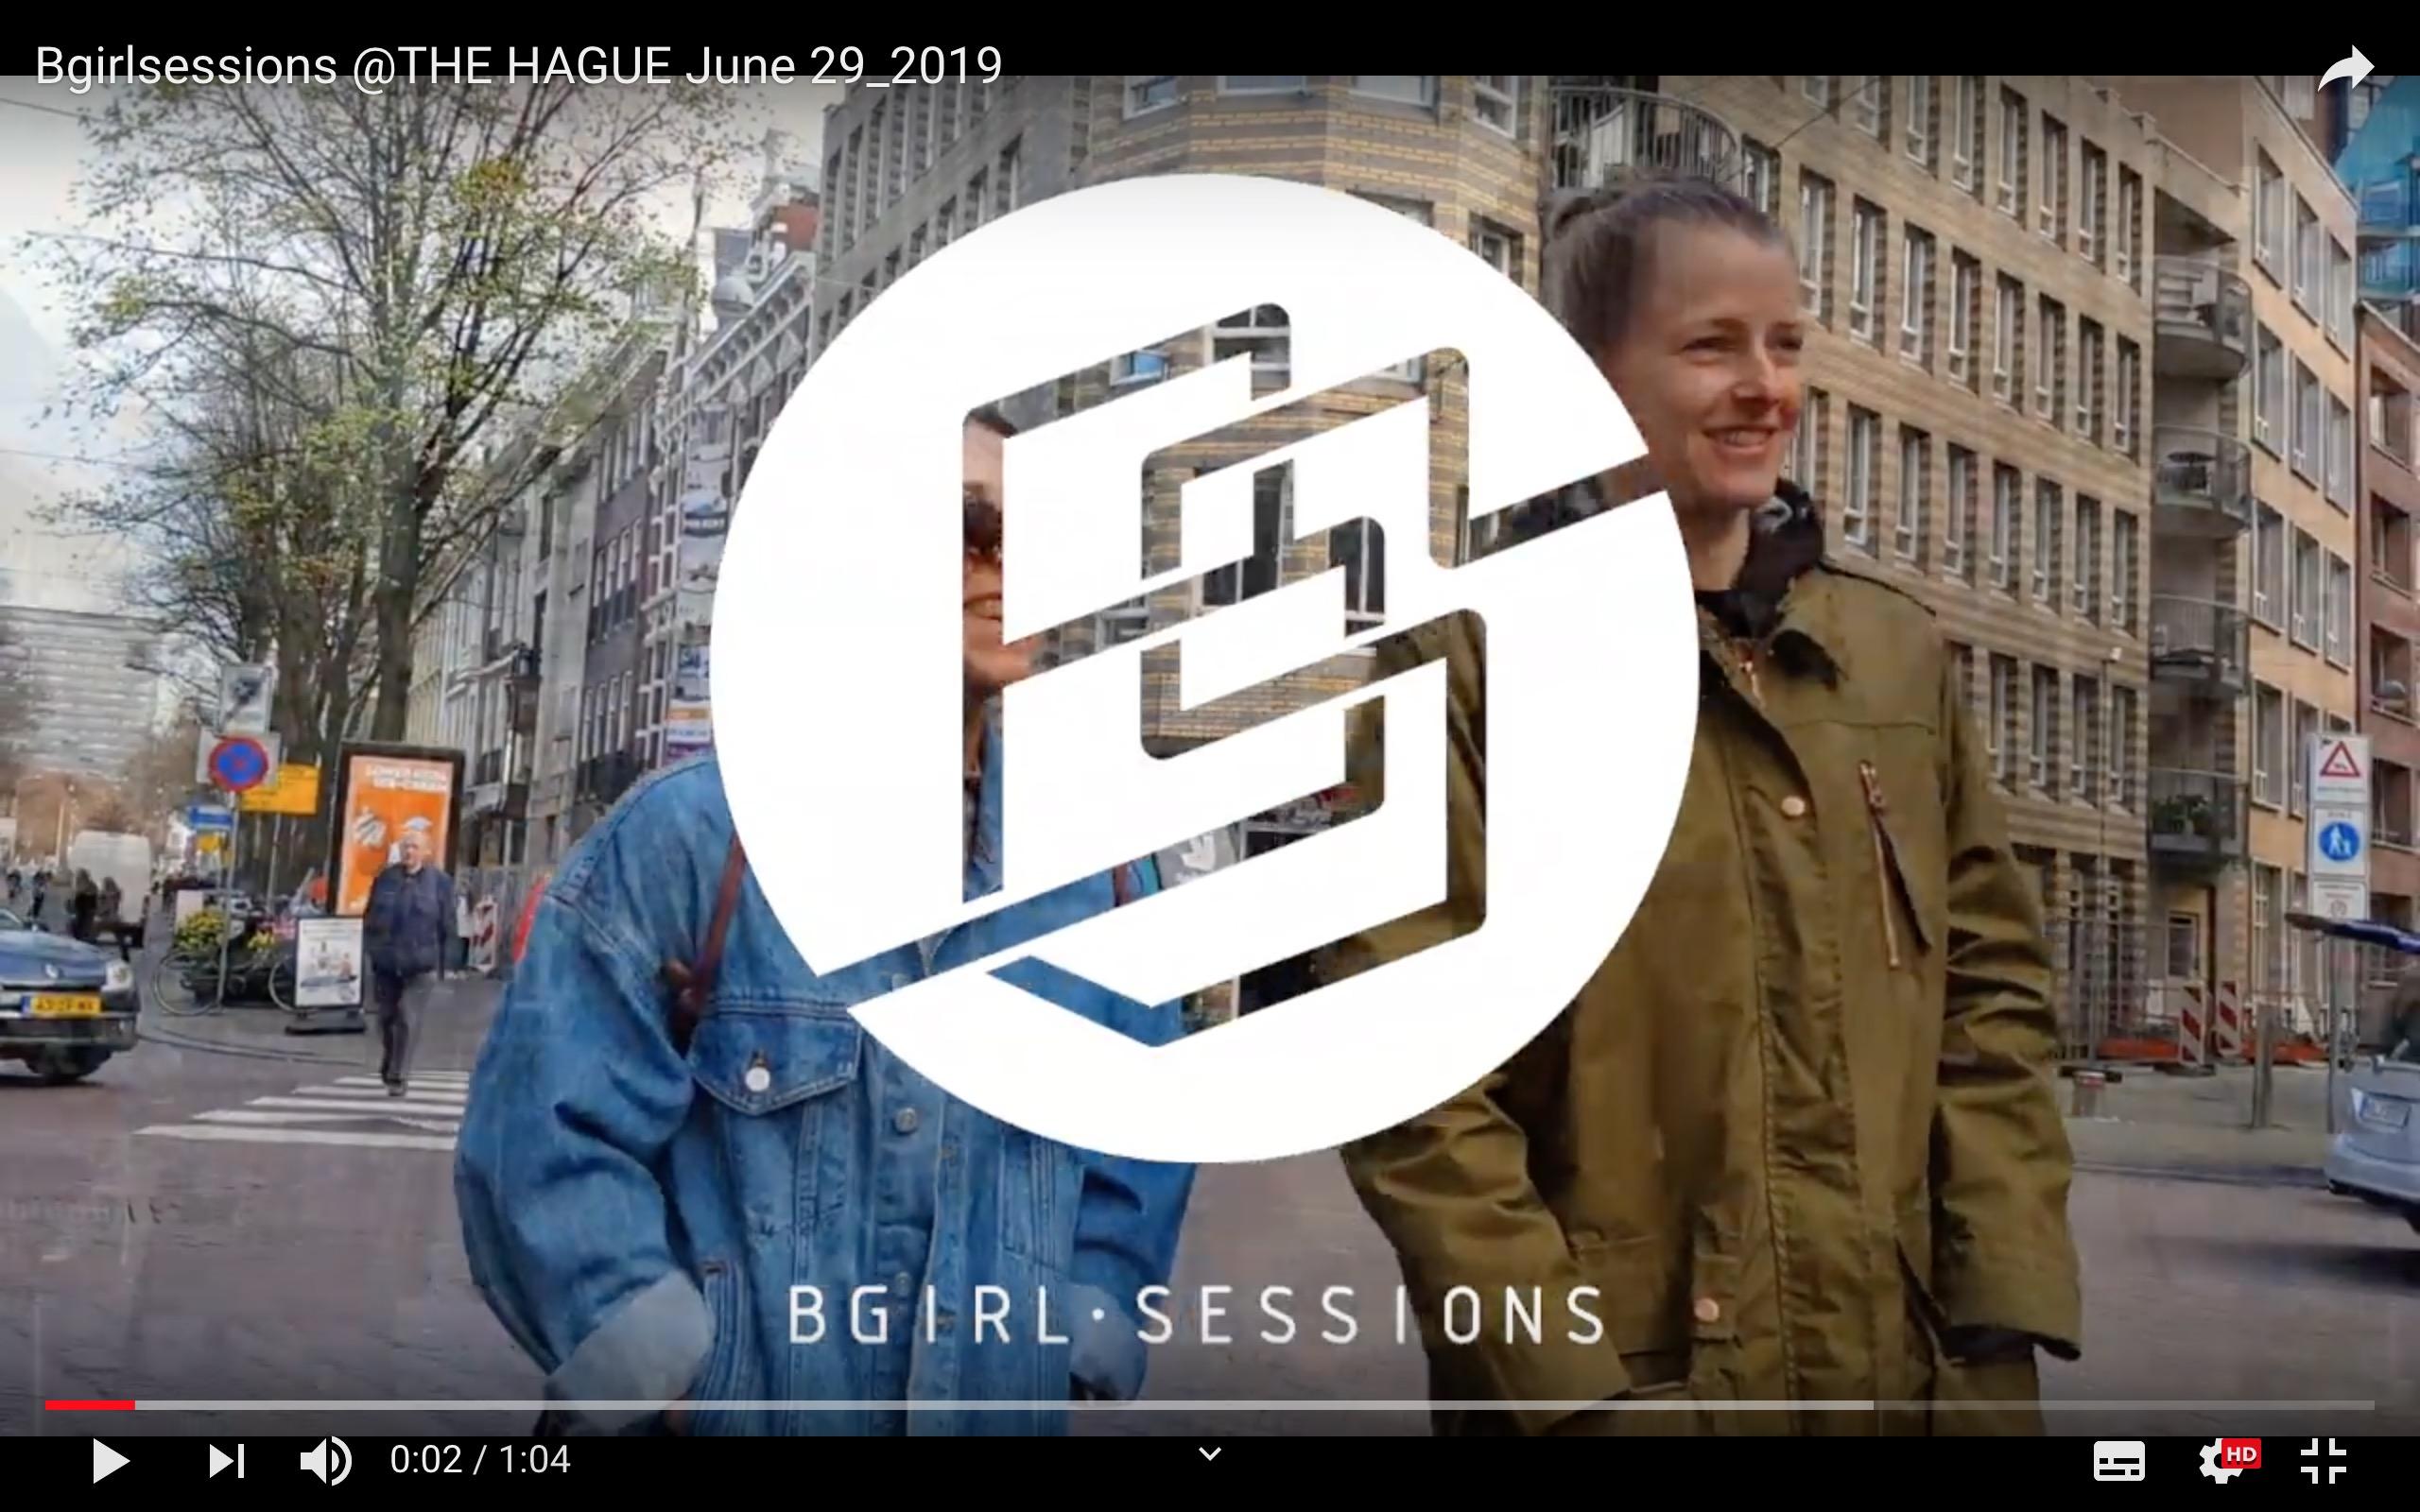 Bgirlsessions@The Hague